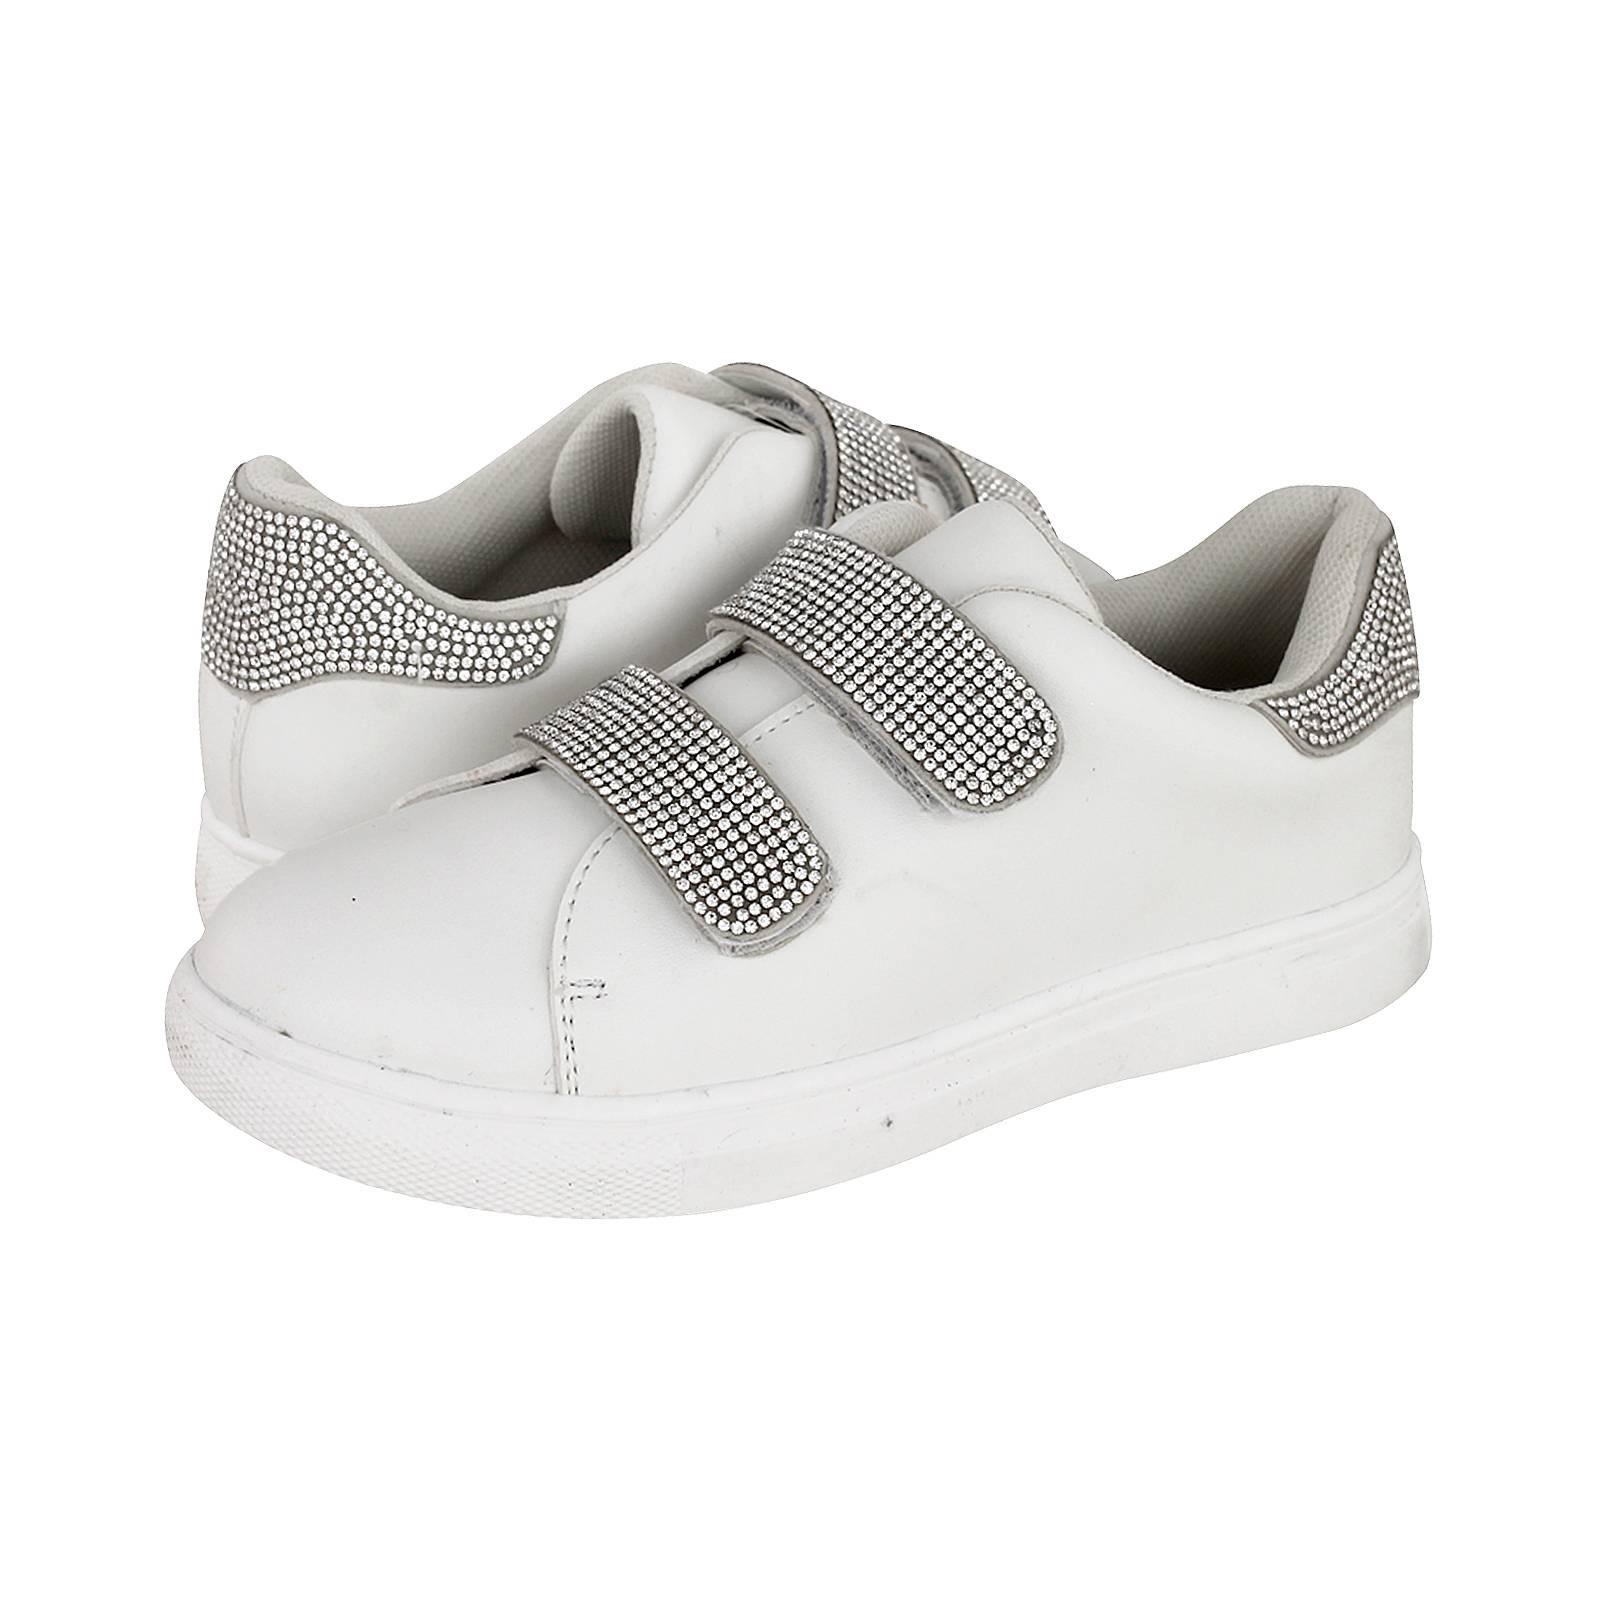 Coats - Παιδικά παπούτσια casual Energy από δερμα συνθετικο και ... febe9f5e8f1